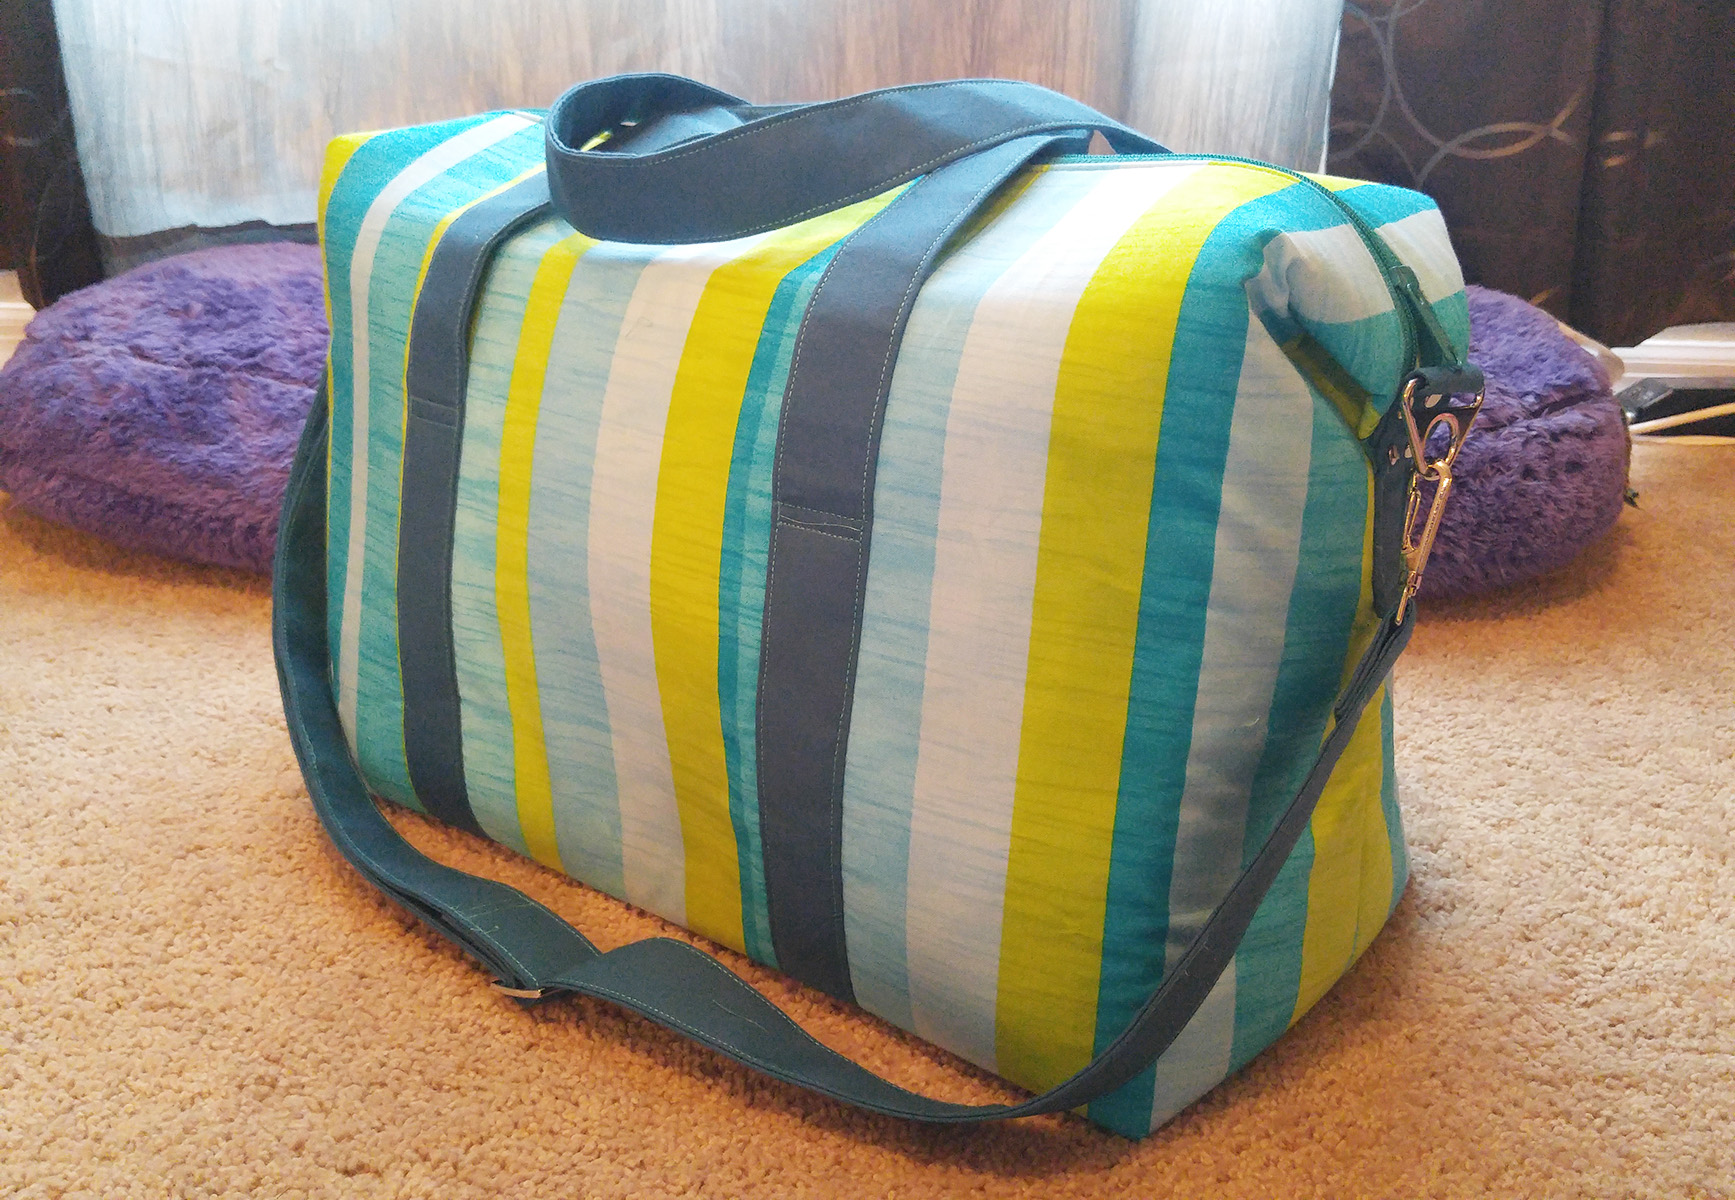 Sew Sweetness Emblem Duffle Bag, sewn by Jamie